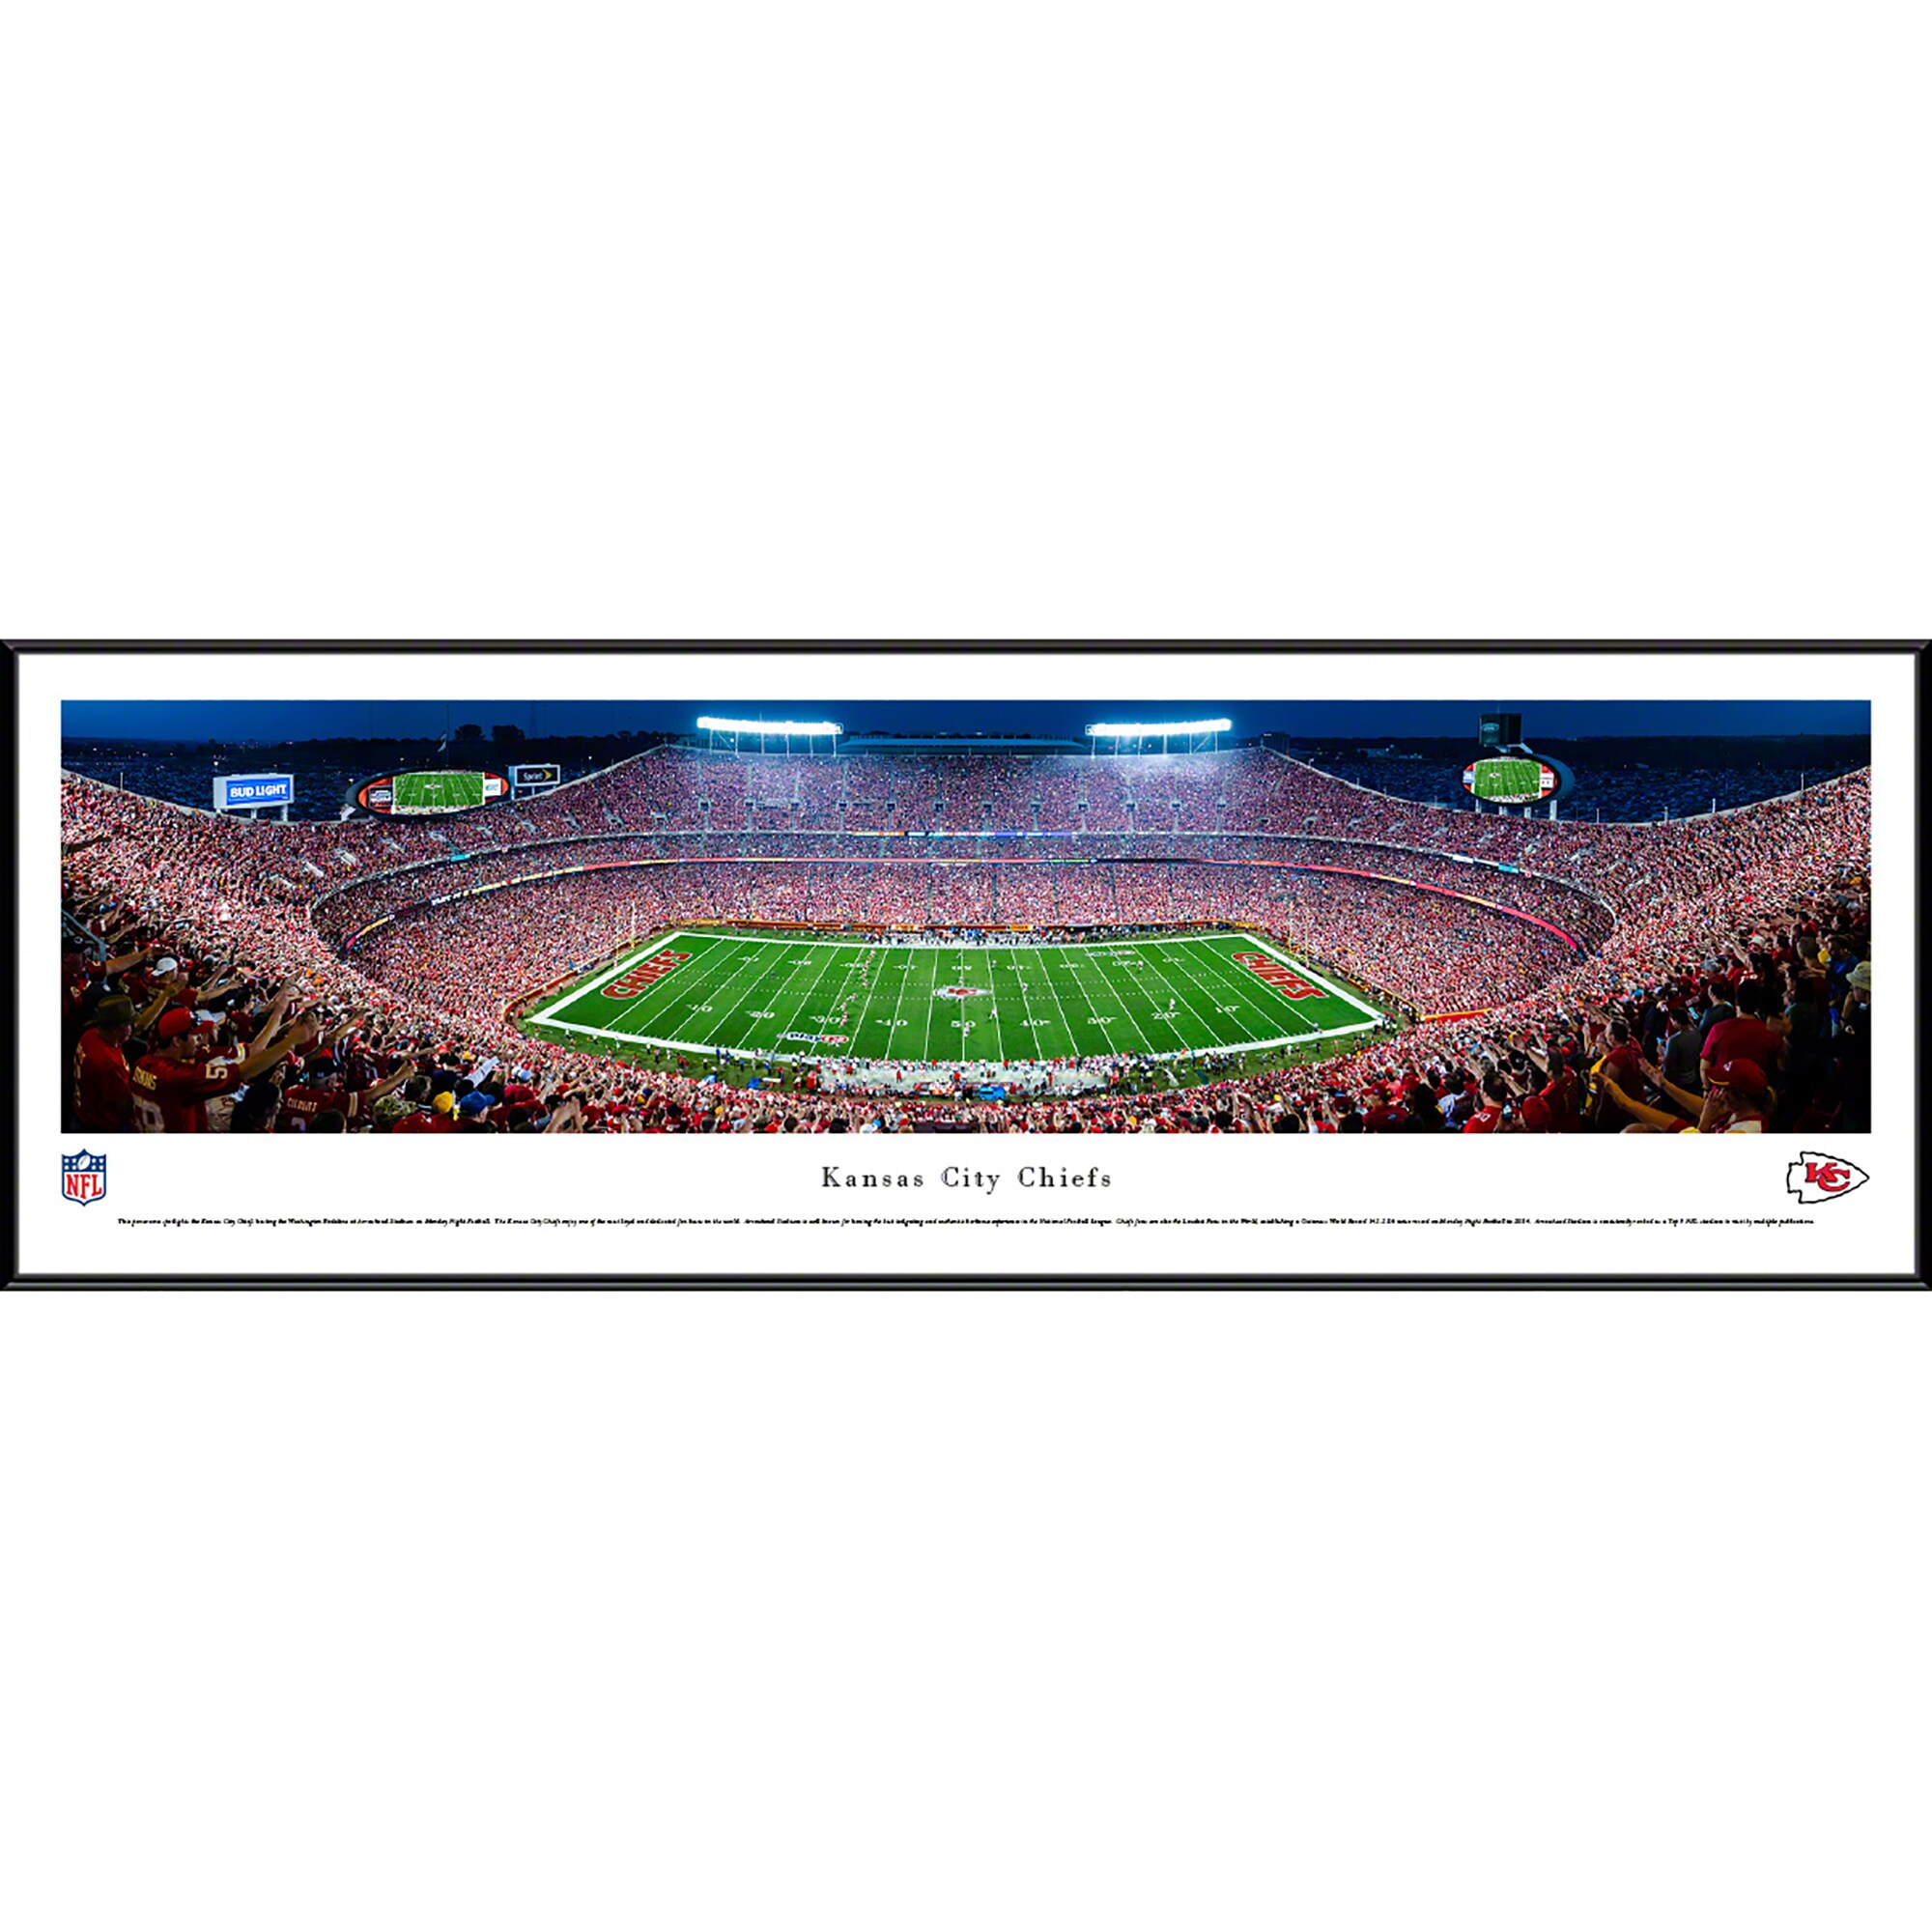 "Kansas City Chiefs 40.25"" x 13.75"" 50-Yard Line Standard Framed Panoramic"